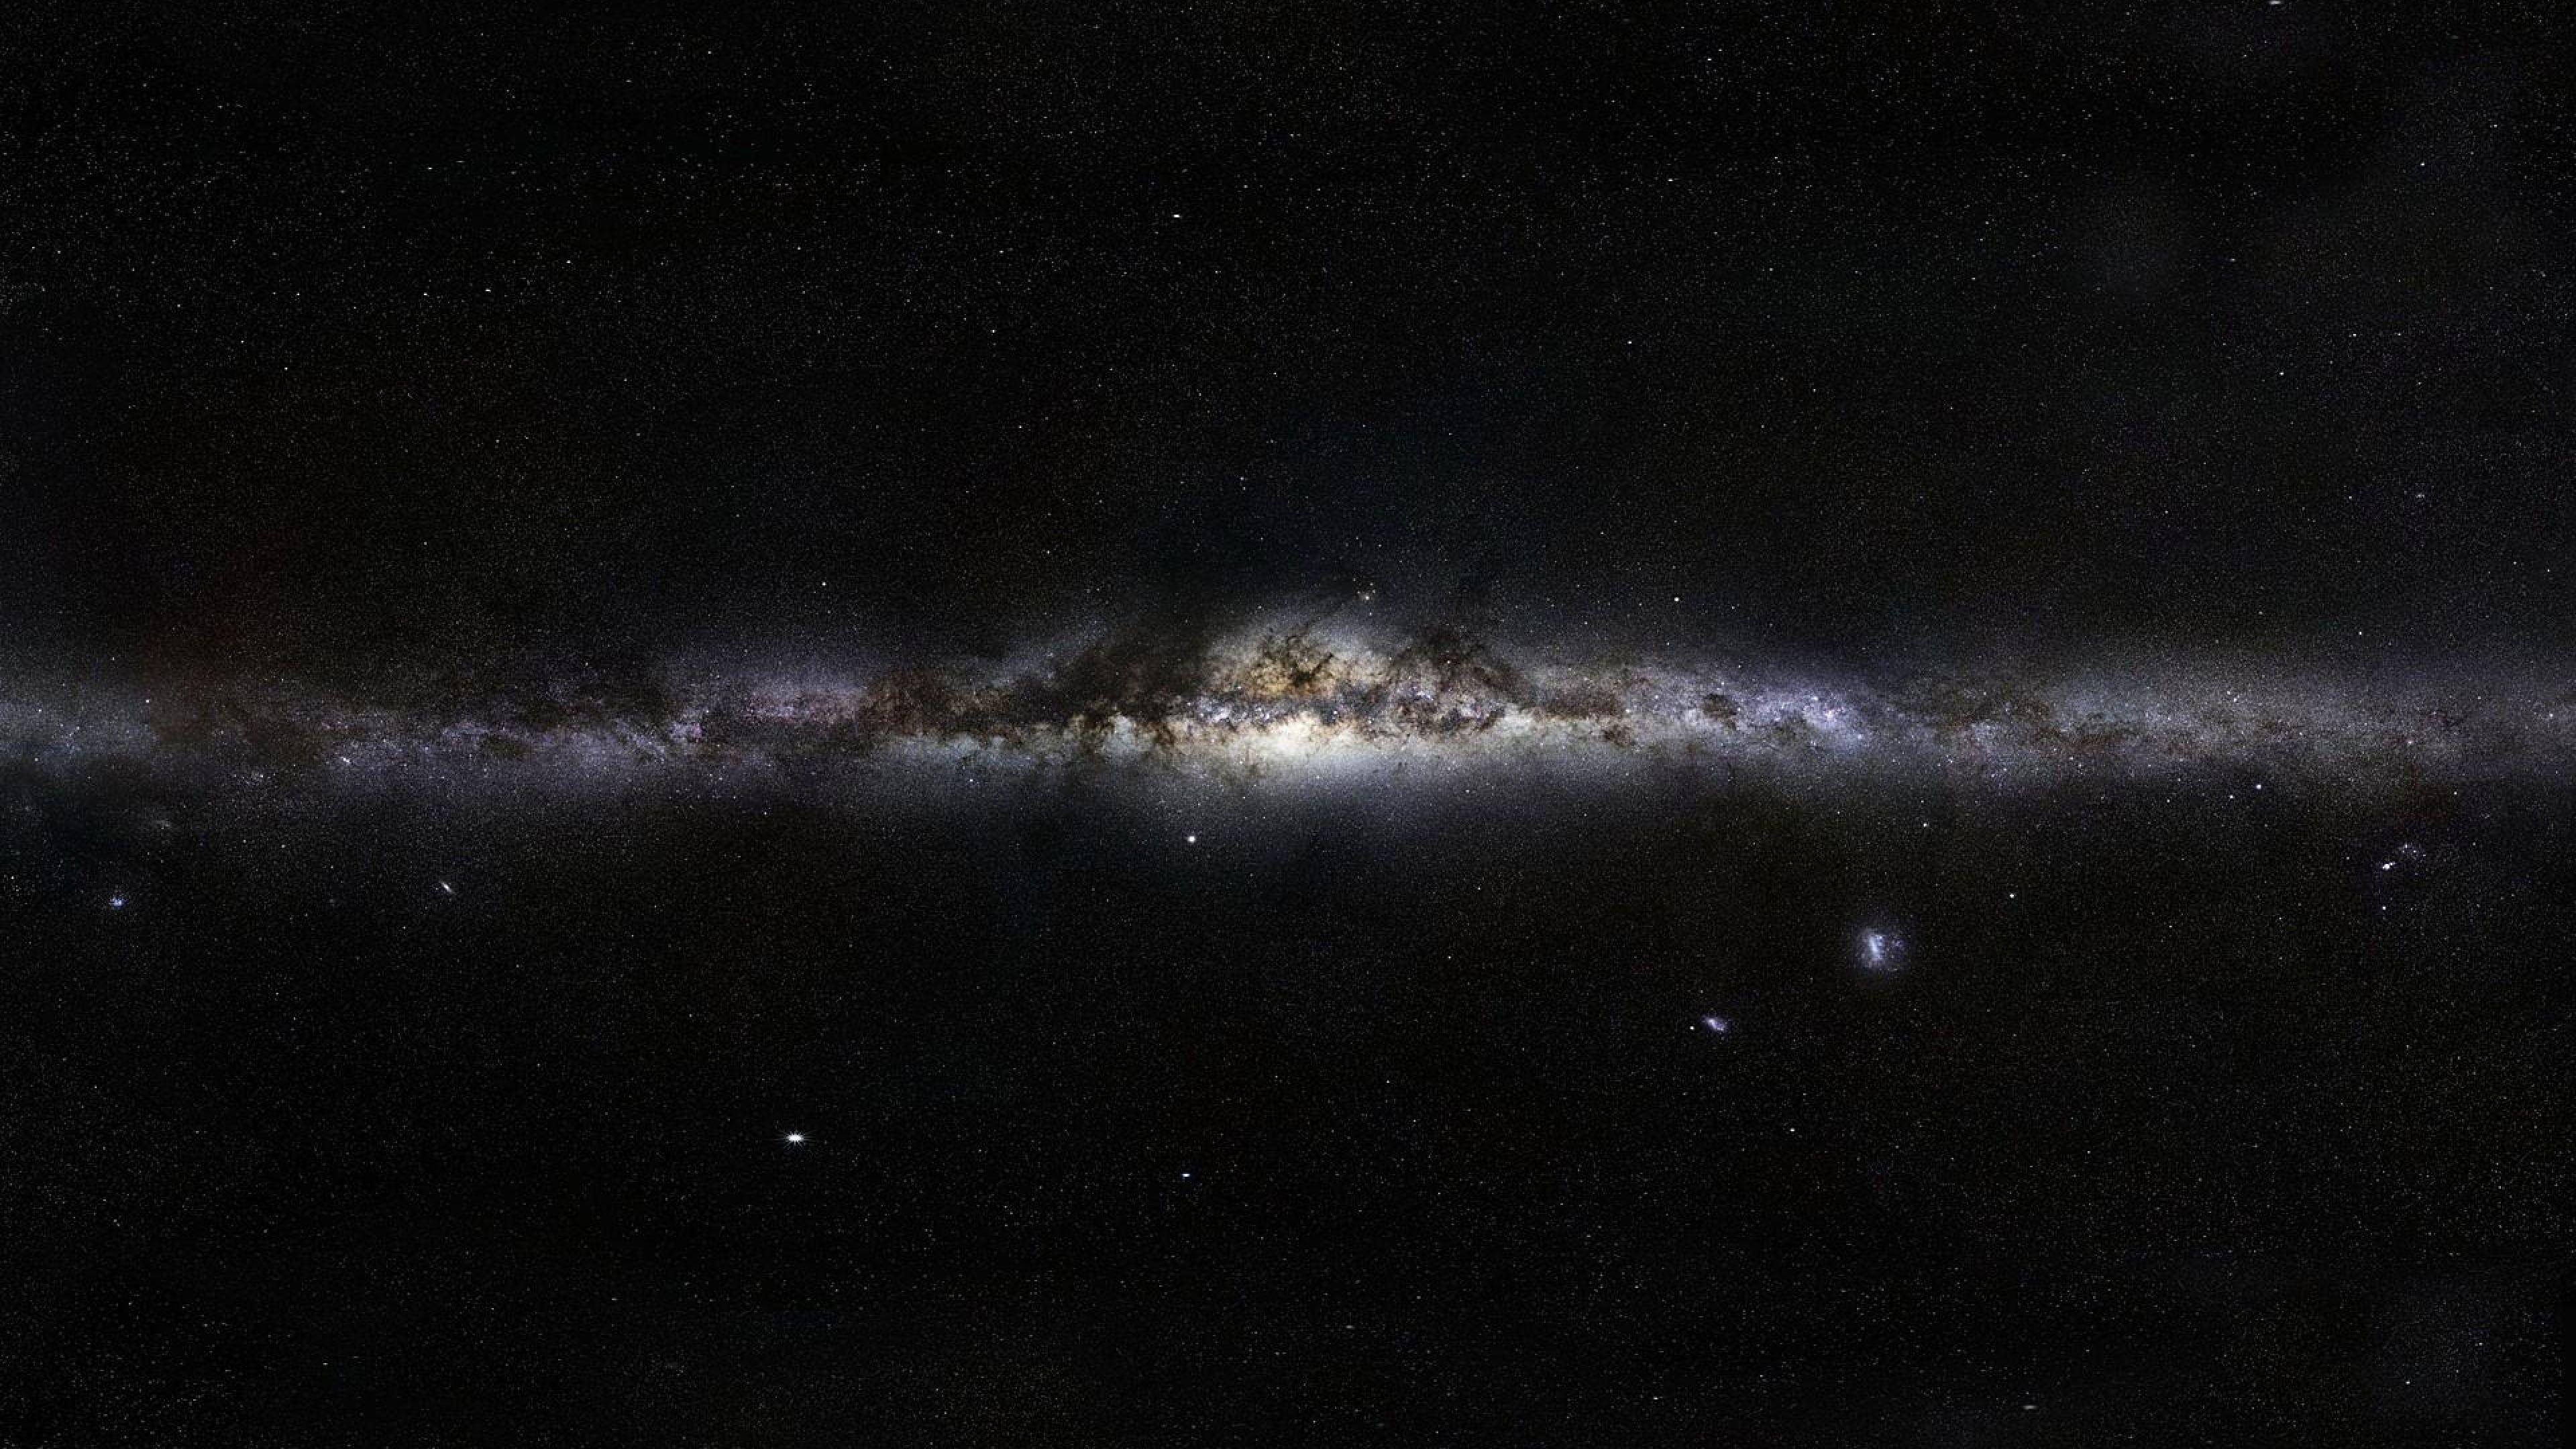 Stunning 4k Stars Dark Space Milky Way Galaxy Stunning 4k Stars Dark 4k Wallpaper Hdwallpaper Desktop Milky Way Milky Way Galaxy Spiral Galaxy